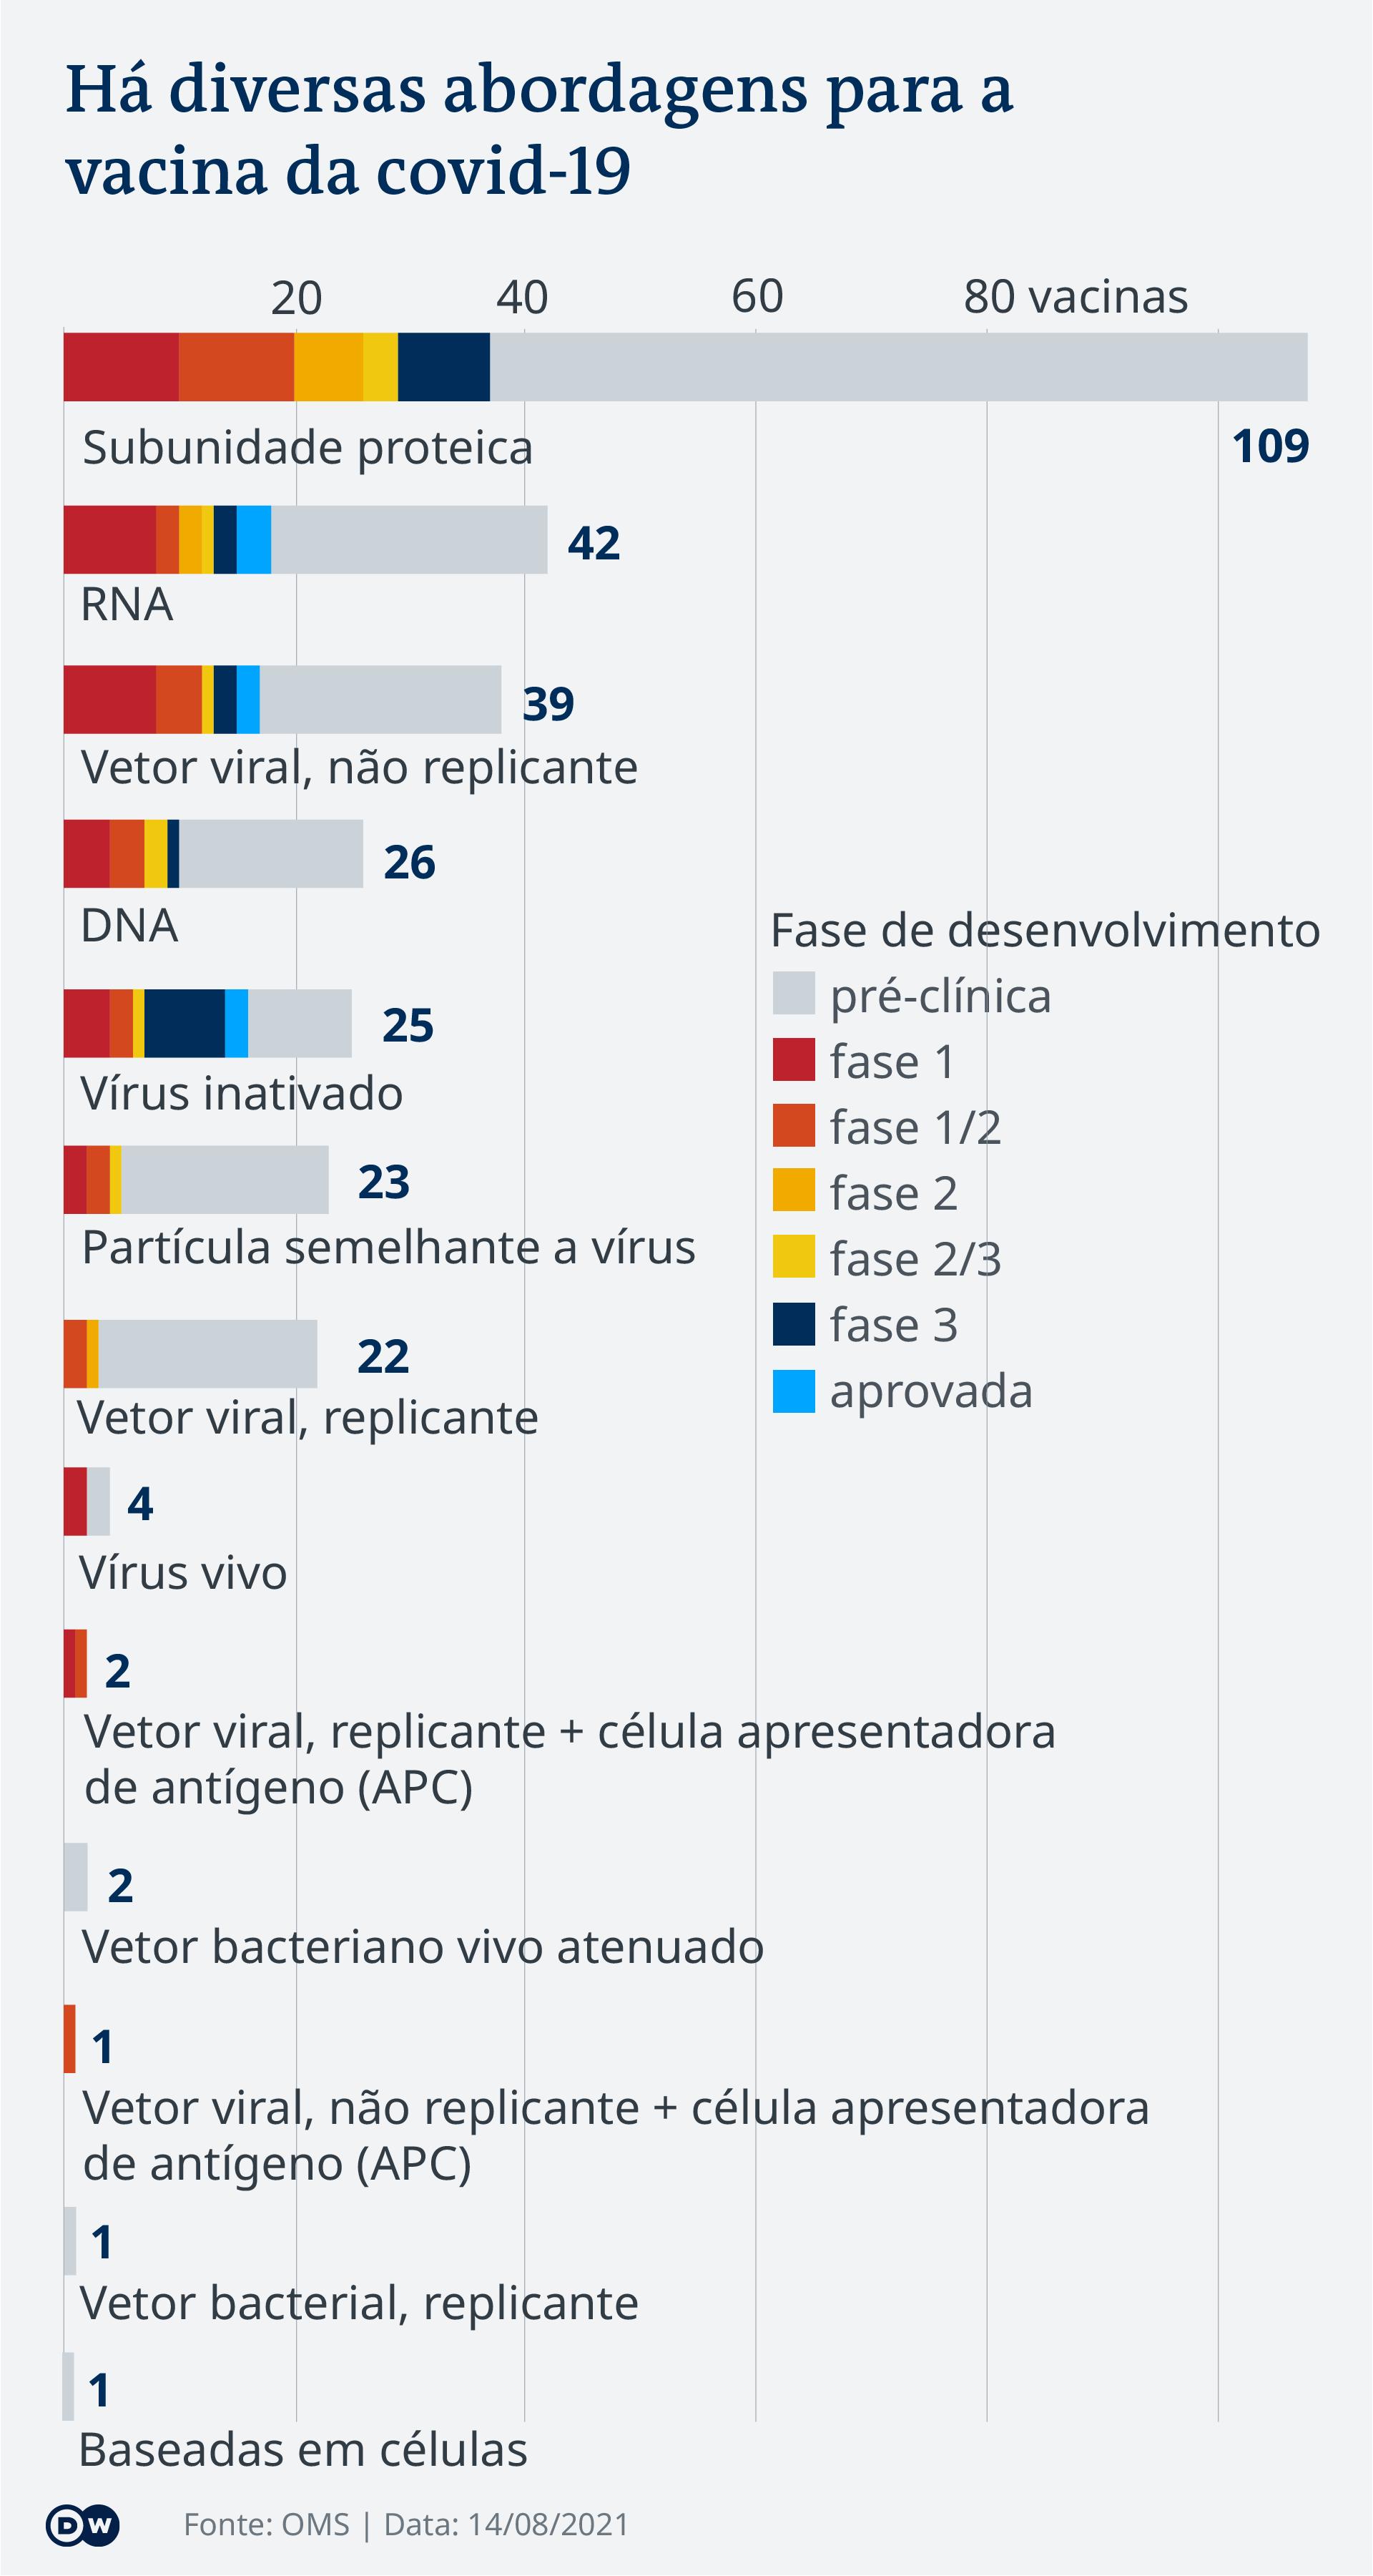 Data visualization - COVID-19 vaccination tracker - Types - Update August 14, 2021 - Portuguese (Brazil)